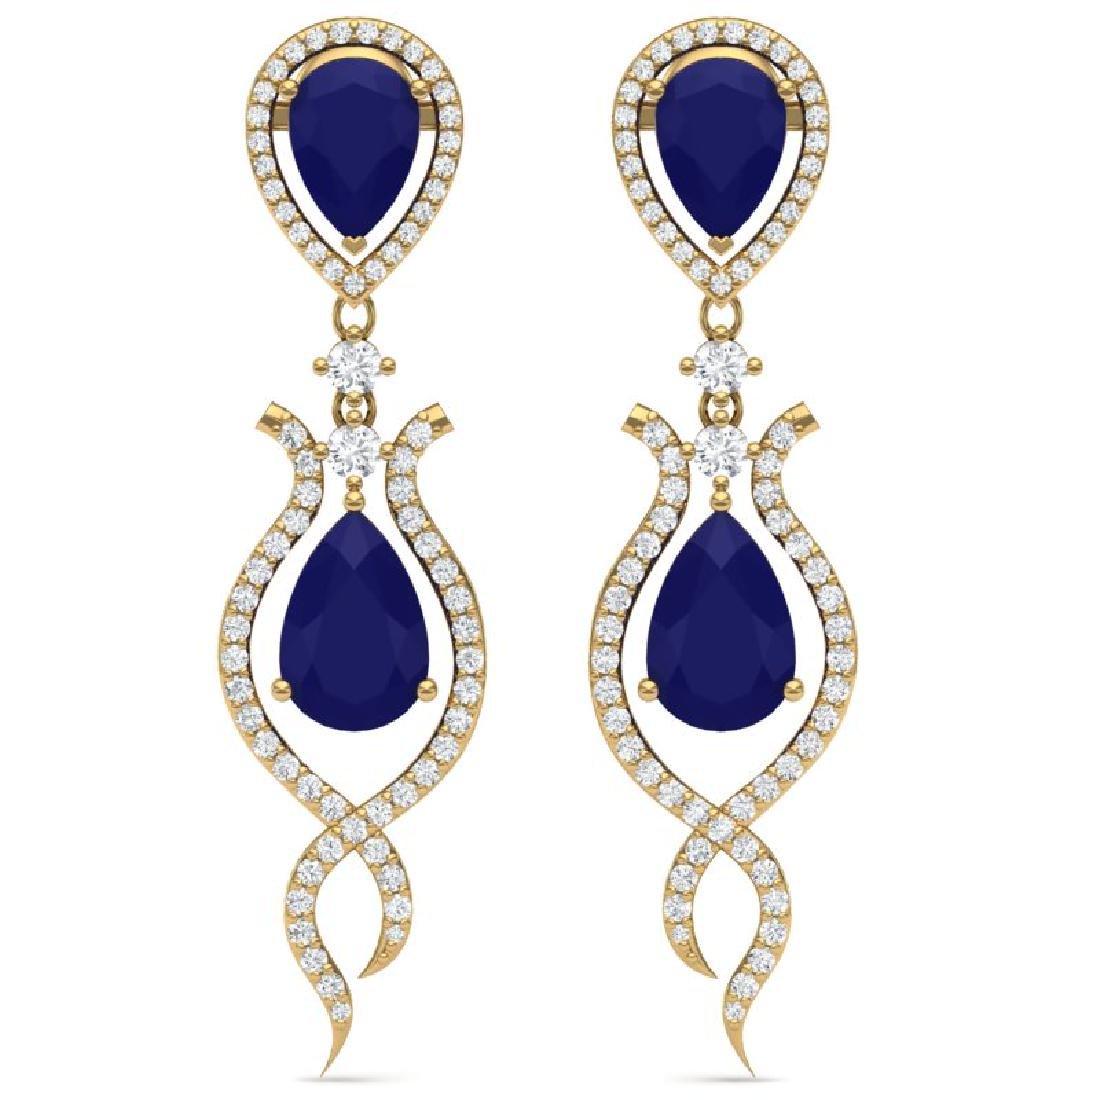 16.57 CTW Royalty Sapphire & VS Diamond Earrings 18K